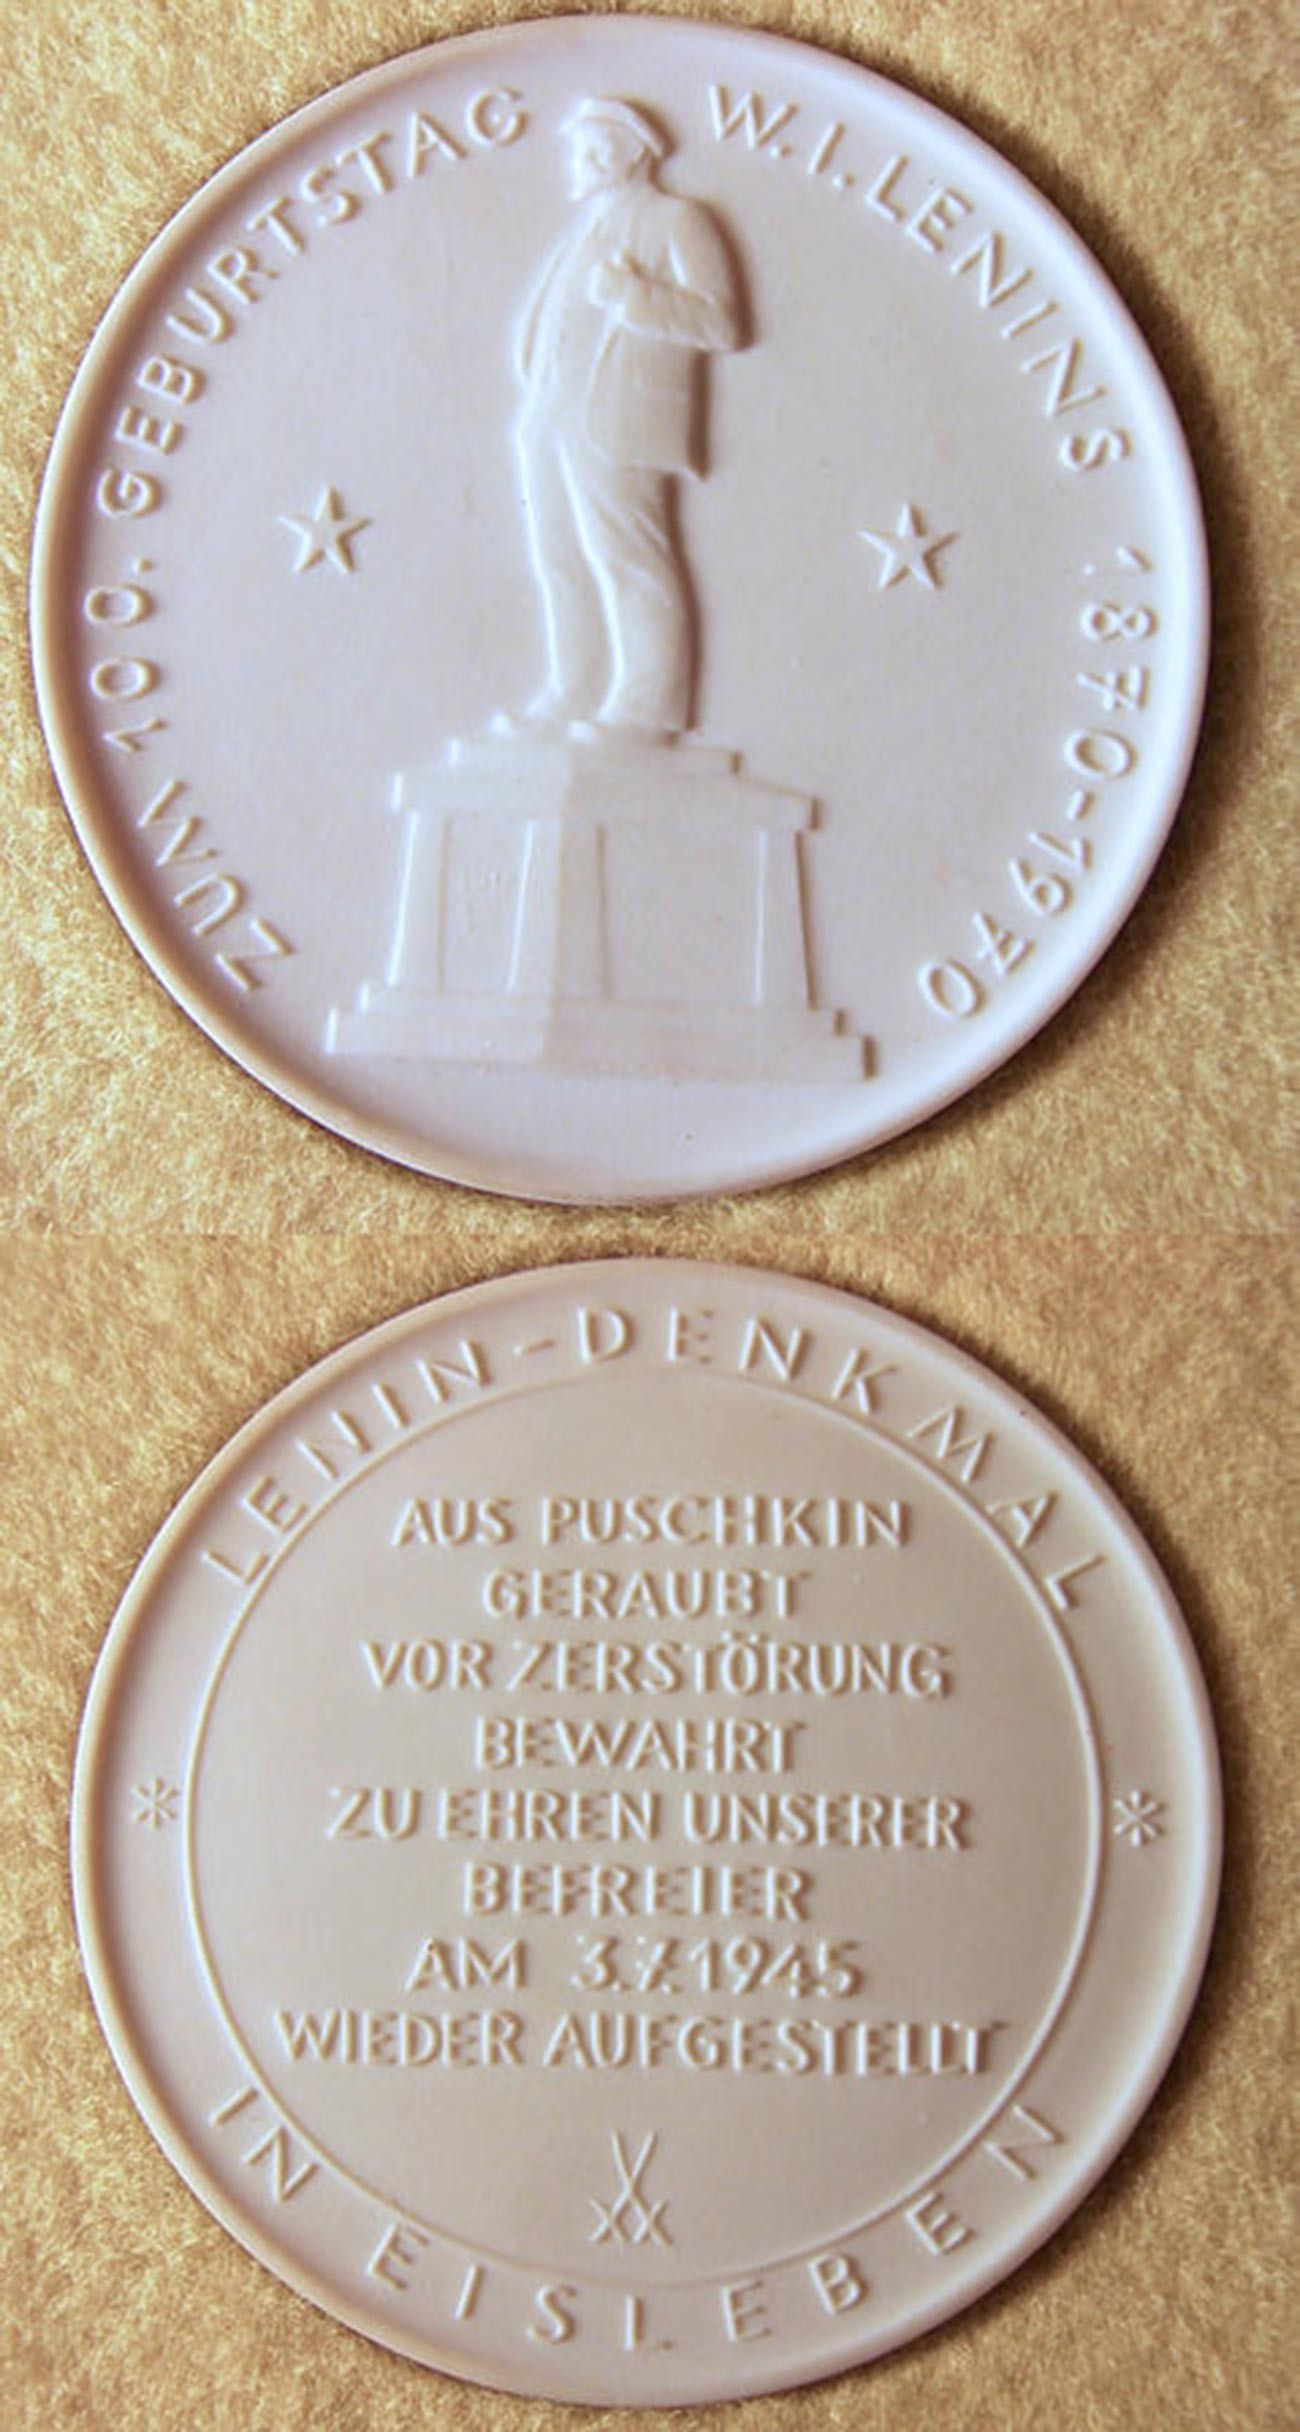 Commemorative medal (1970) made of Meissen porcelain for the 100th anniversary of Lenin's birthday, bearing the picture of the Lenin monument in Eisleben.